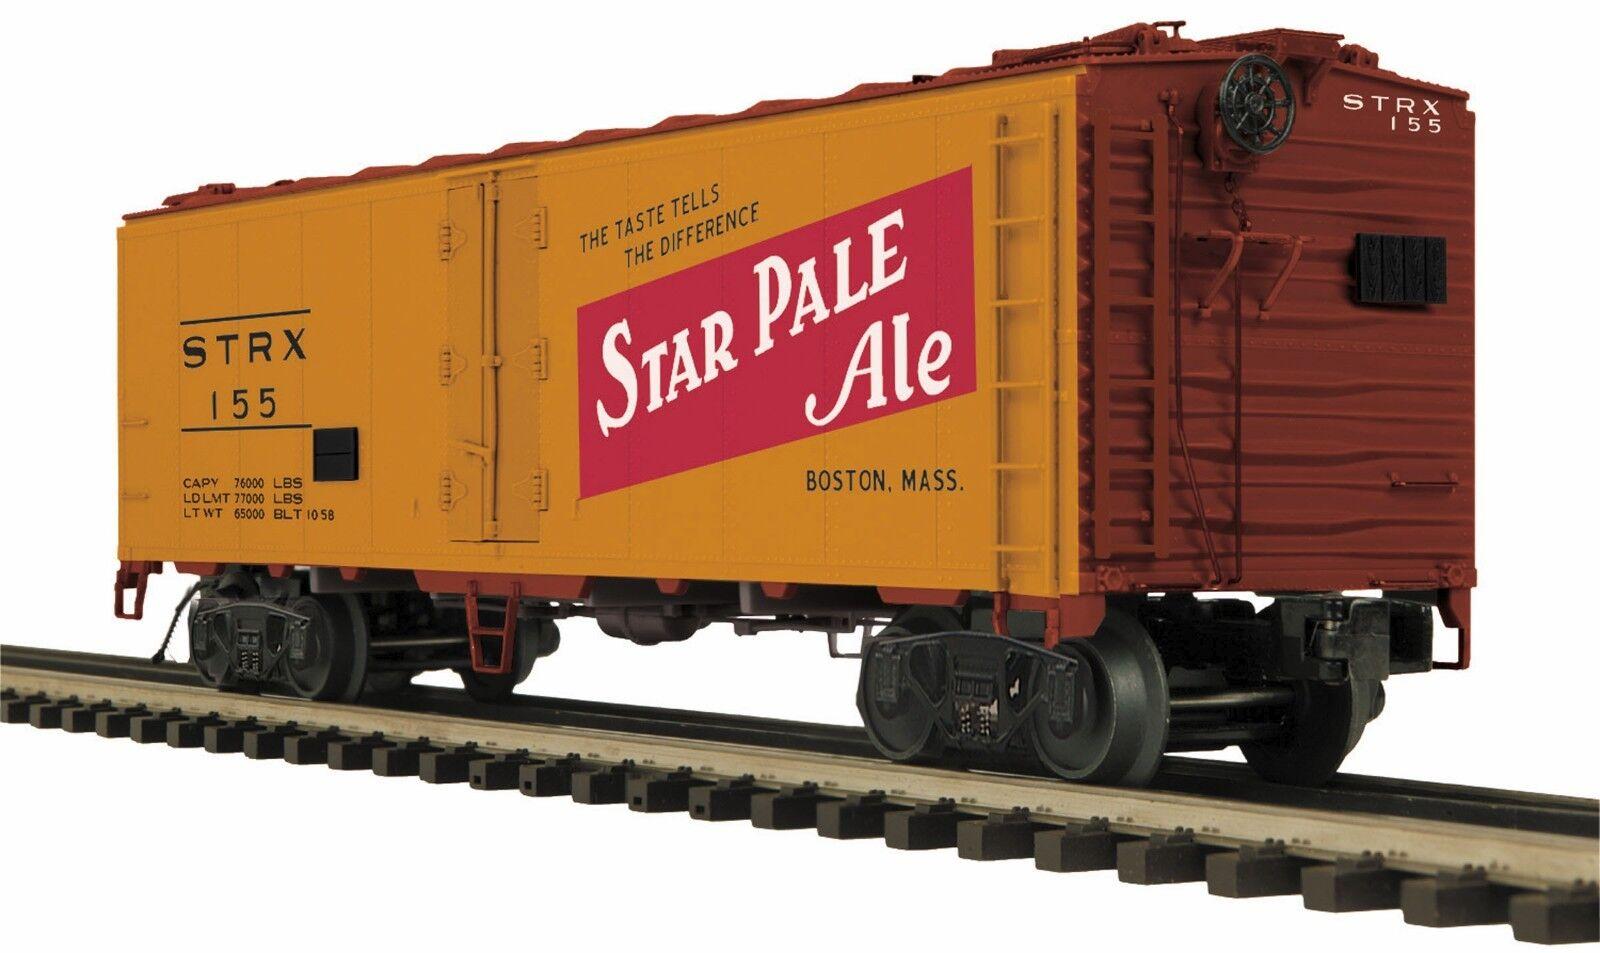 20-94214 Star Pale Ale 40' Steel Sided Reefer Car